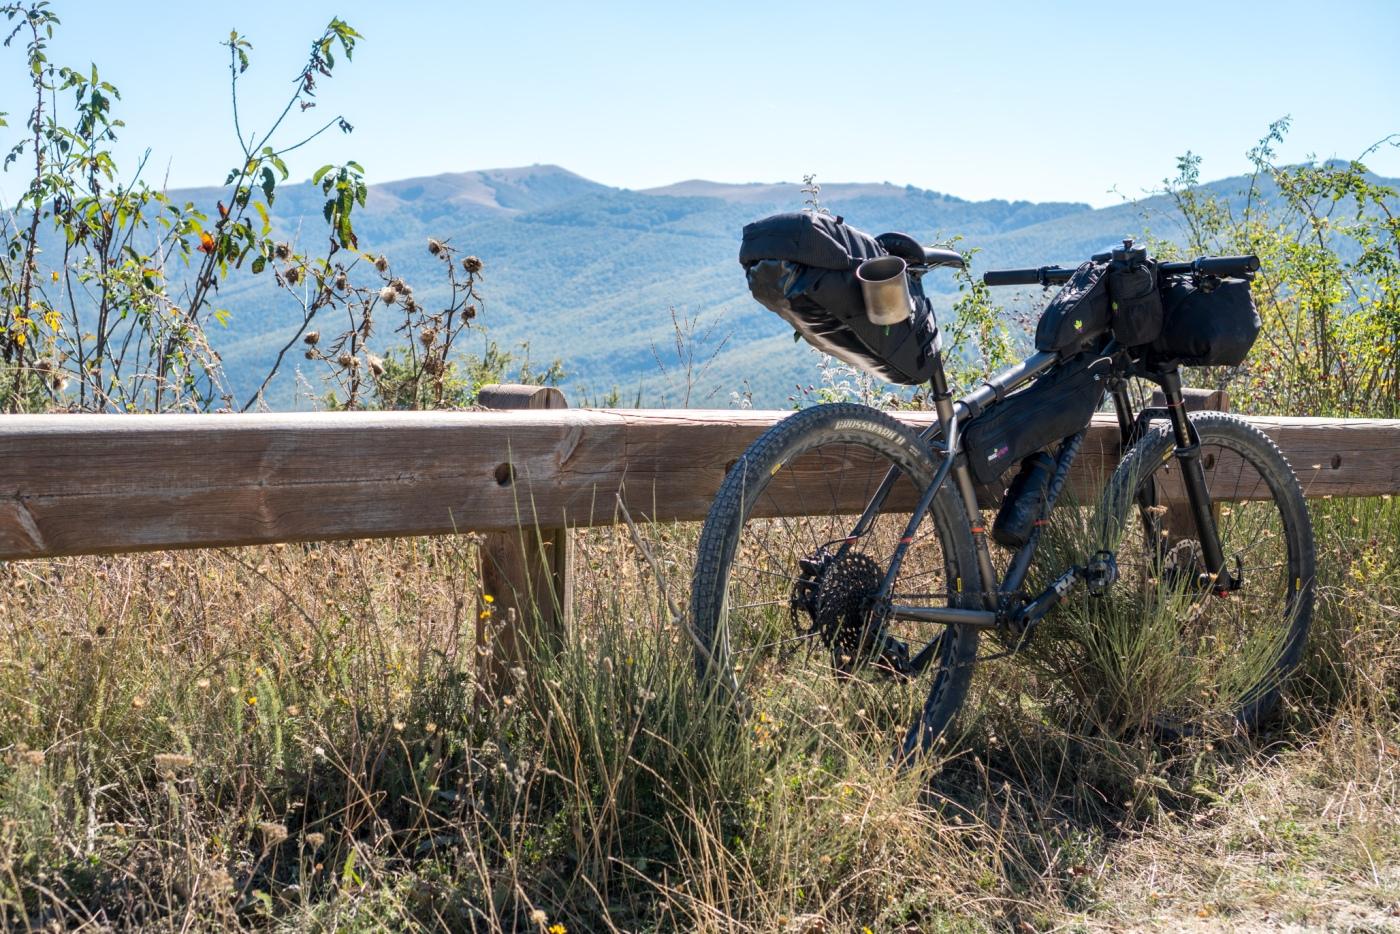 pratomagno_bikepacking-40